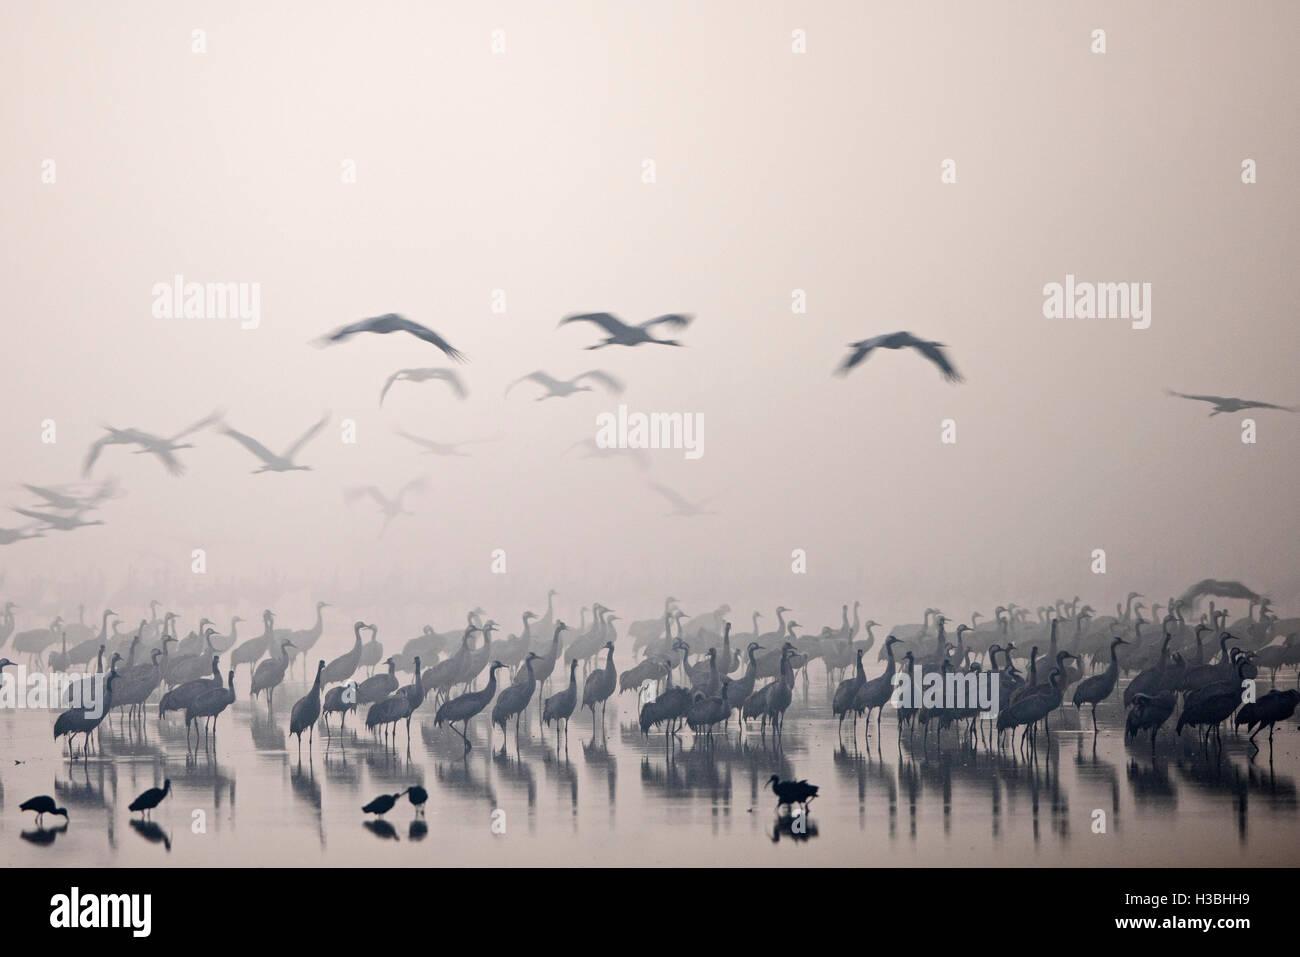 Common Cranes, at overnight roost at dawn, Grus grus, wintering at  the Hula Lake Park Israel Stock Photo